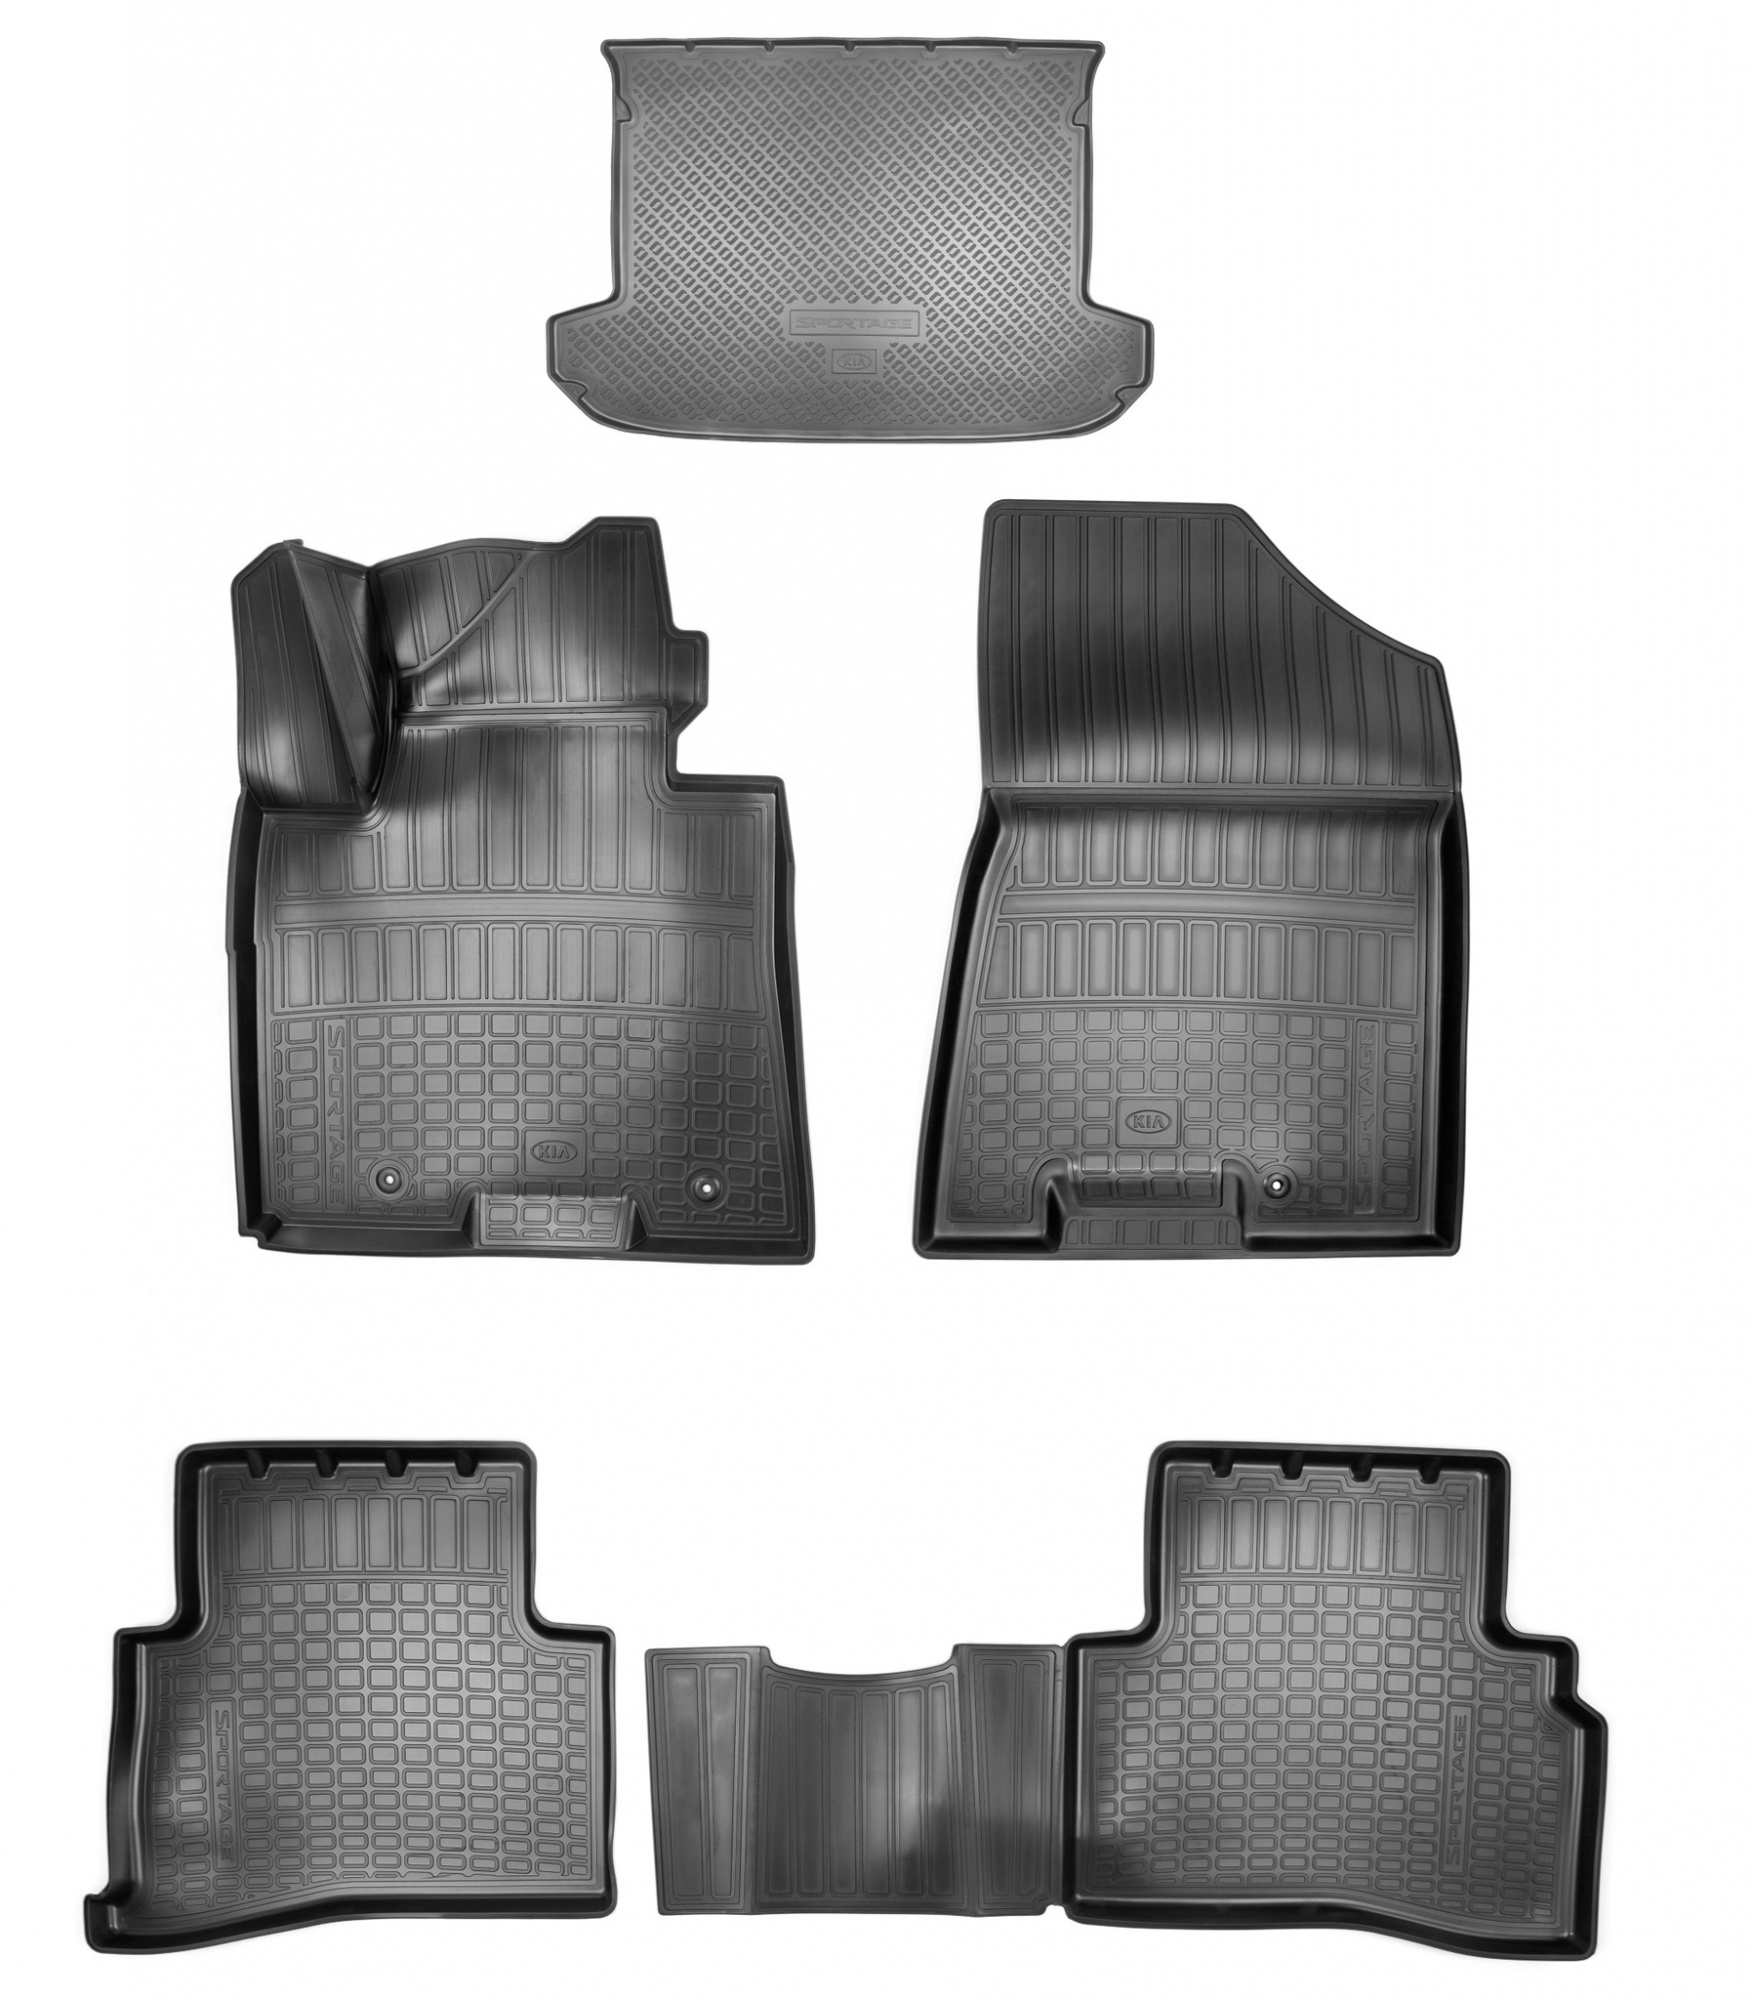 Коврики в багажник Hyundai/Kia полиуретан серый R8130F1003P Kia Sportage (4G) рест. 2018- недорого